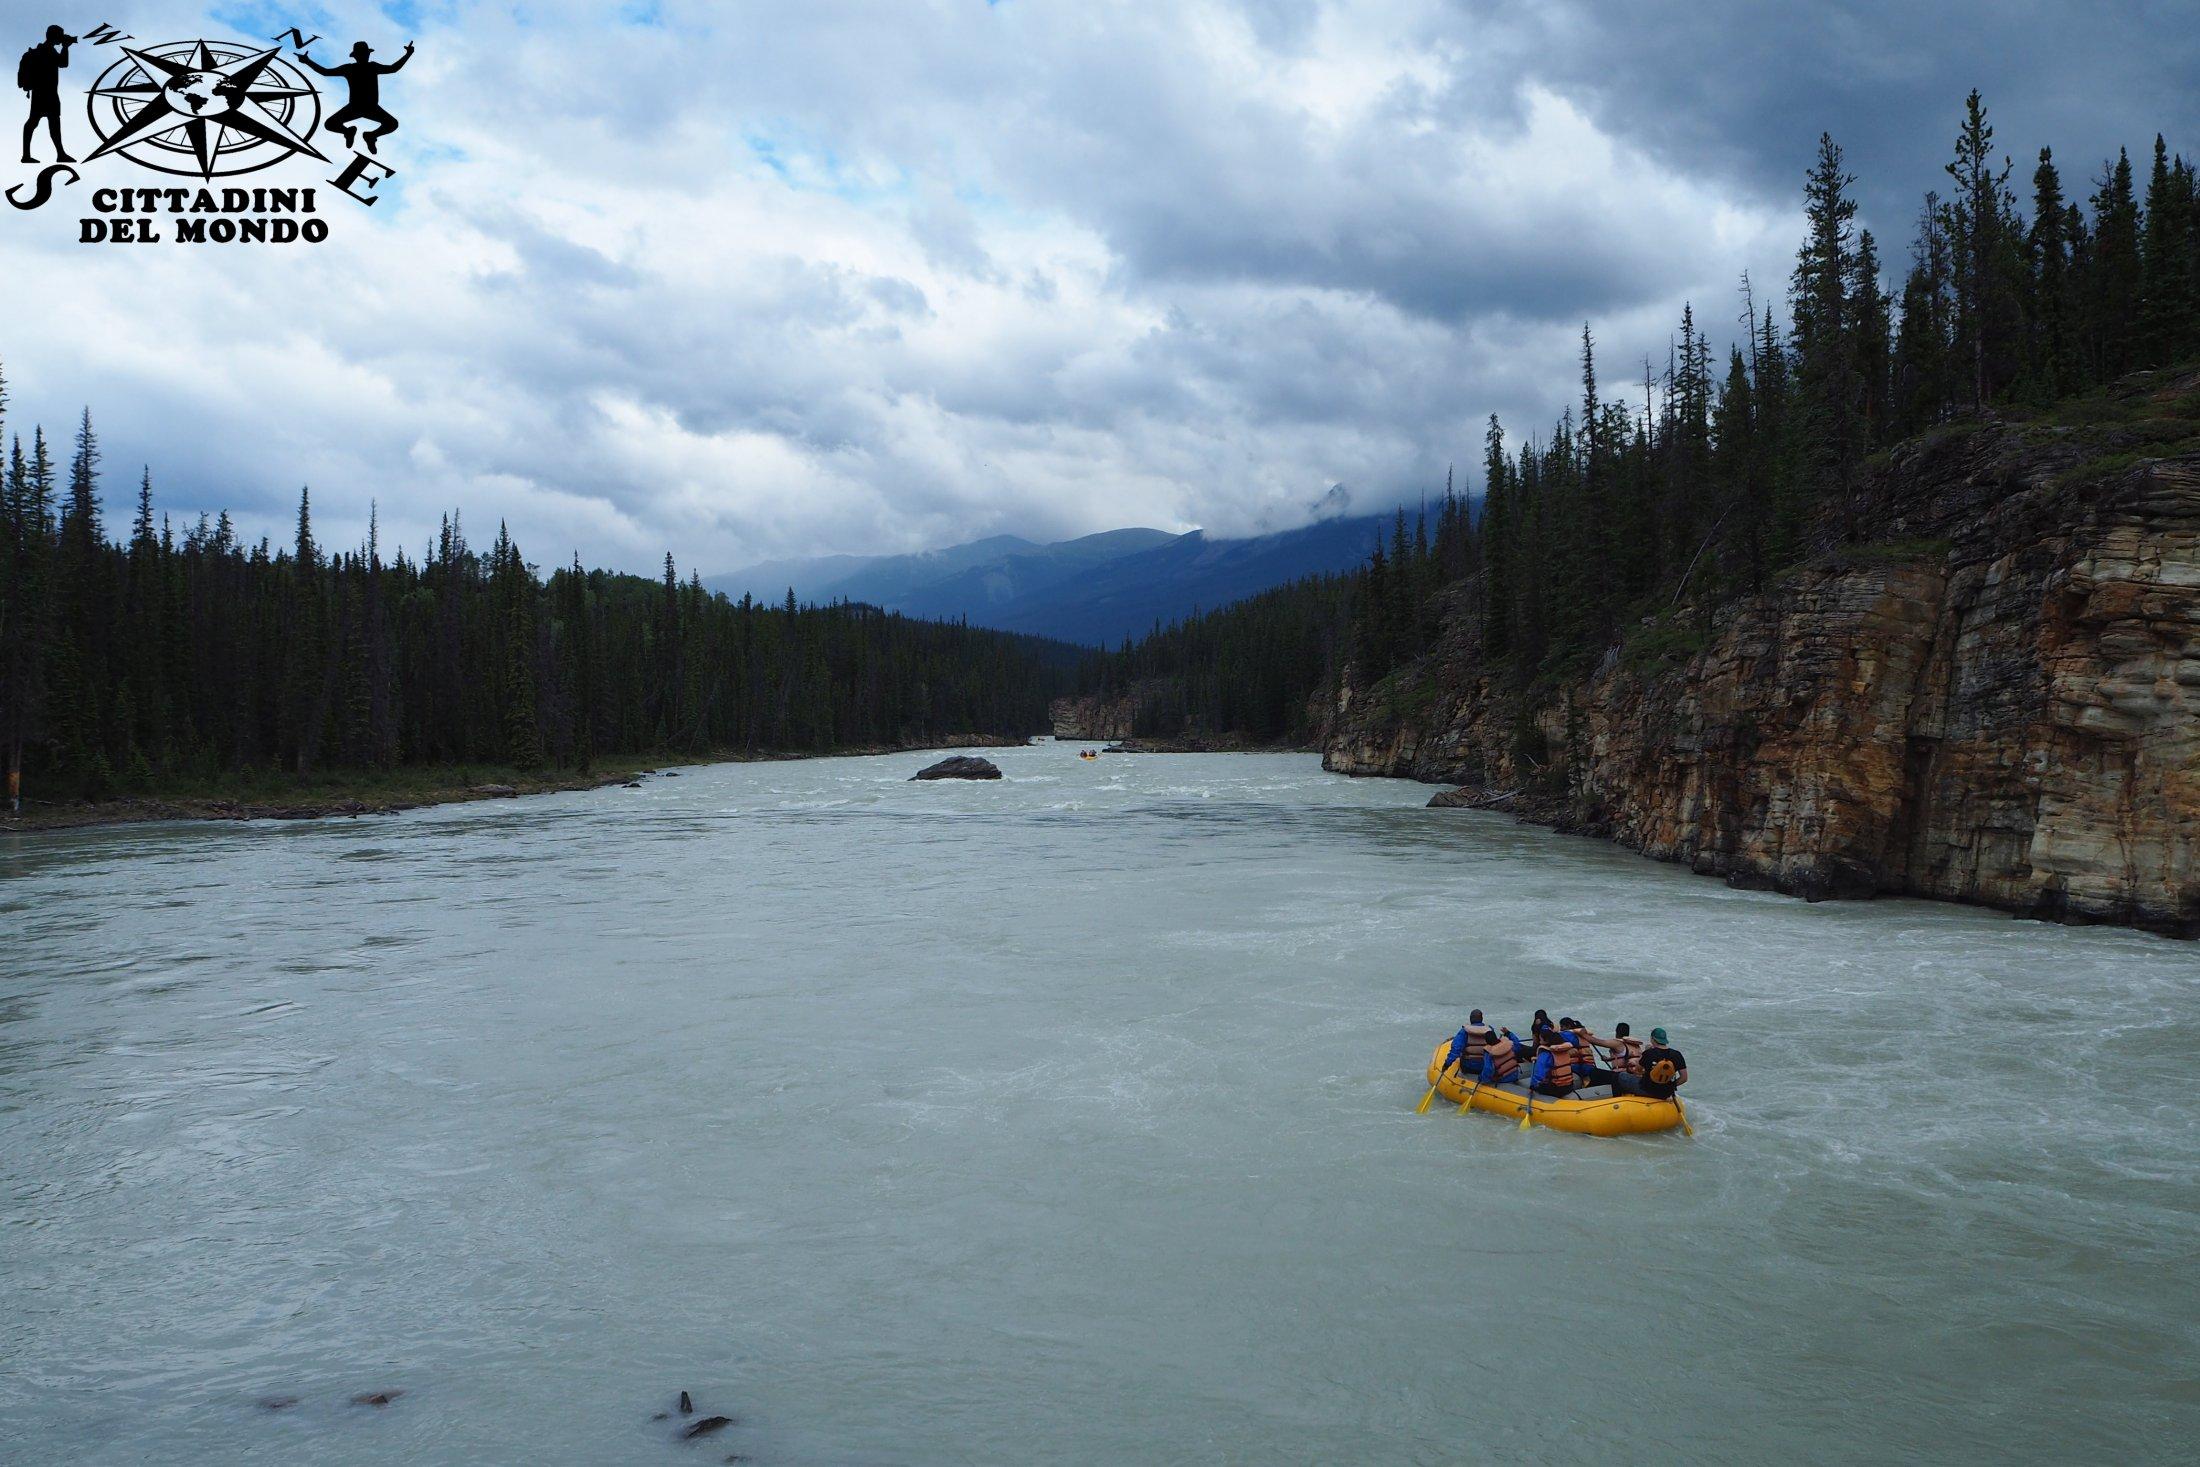 Galleria Canada: Athabasca Falls